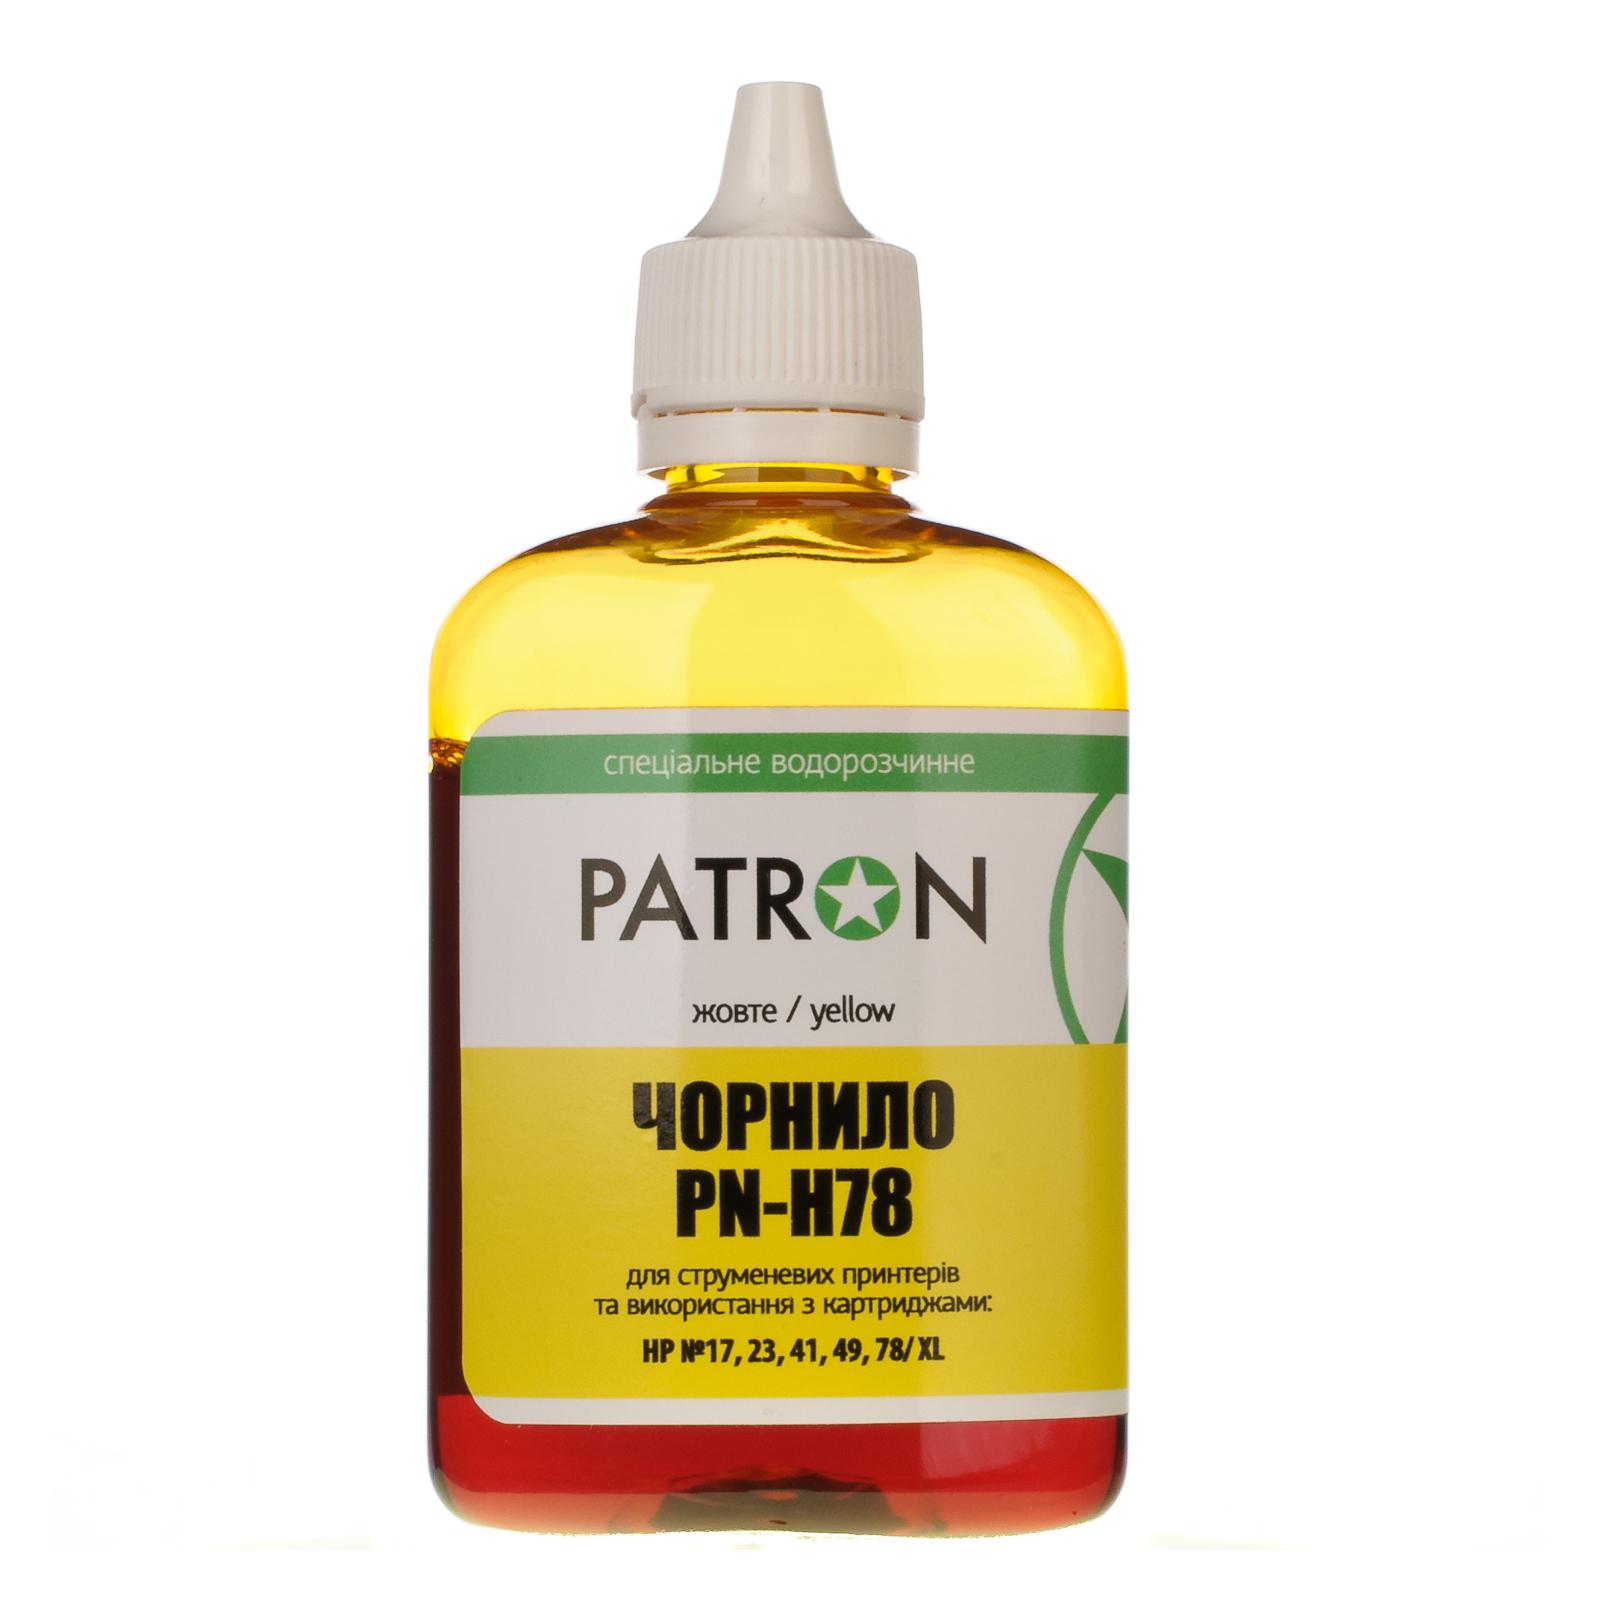 Чернила PATRON HP №17/23/41/78 90г YELLOW (I-PN-H78-090-Y)